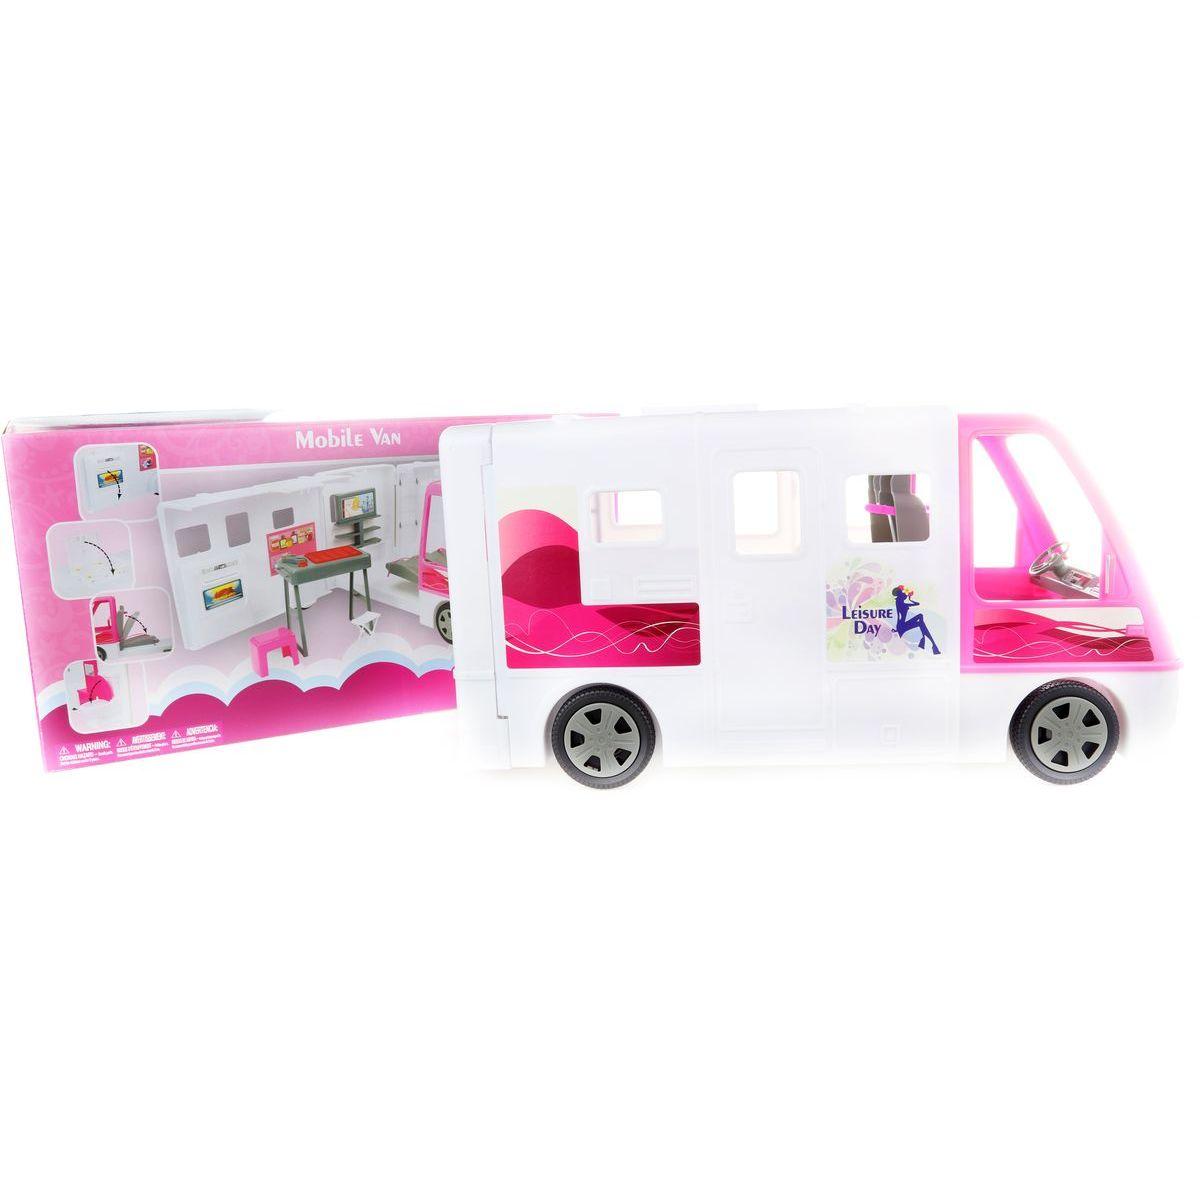 Lamps Velký bílý karavan pro panenky Lamps